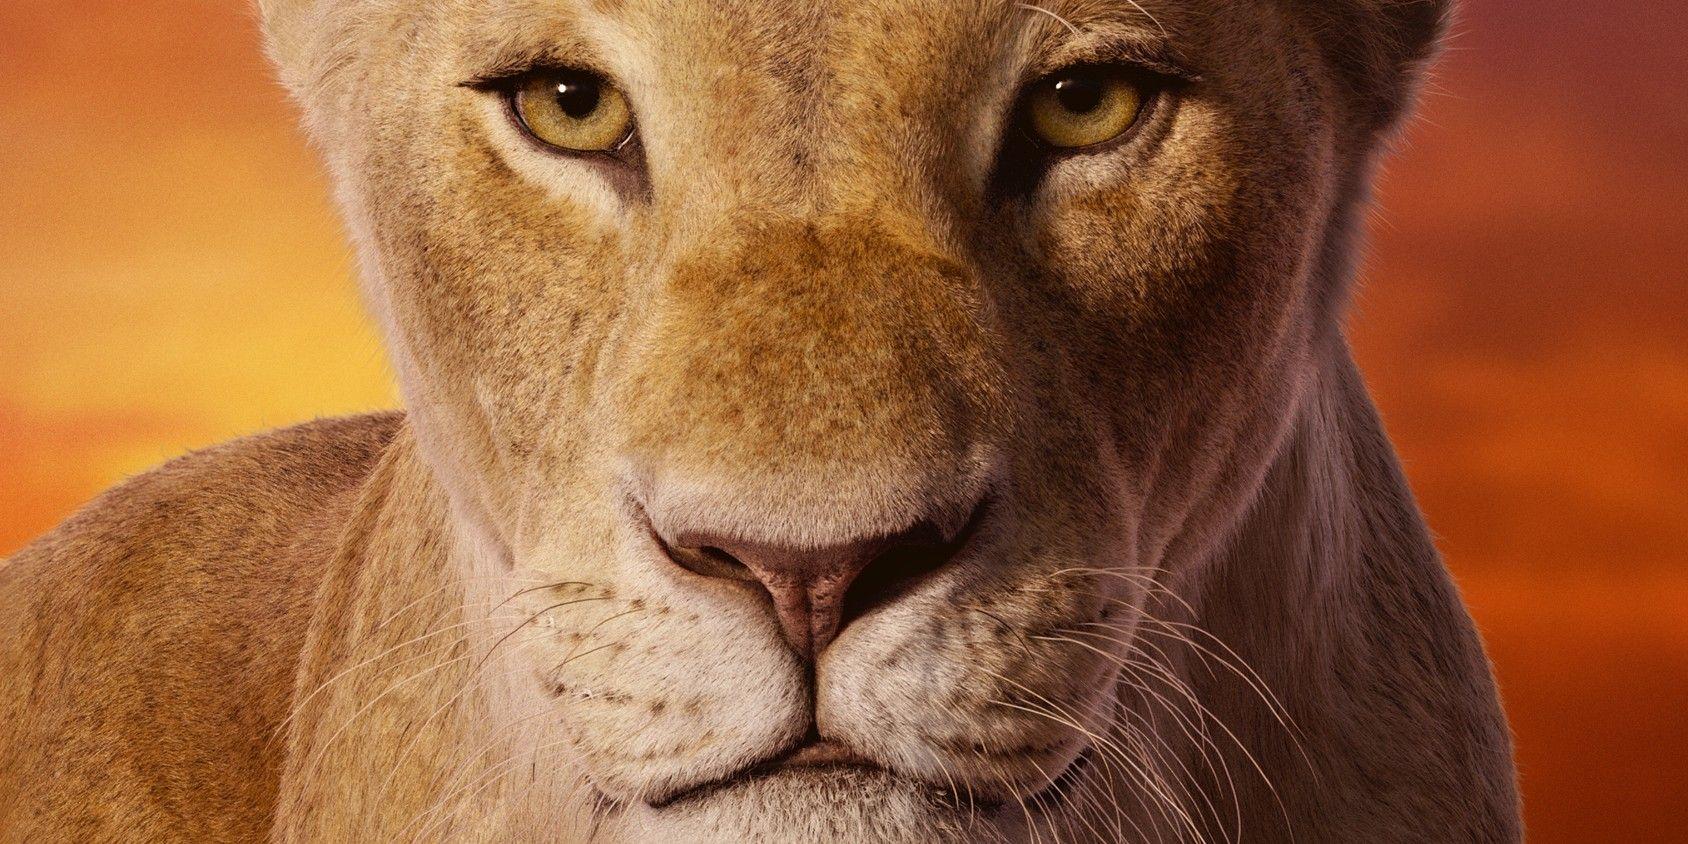 disney u0026 39 s lion king tv spot reveals footage of beyonc u00e9 u0026 39 s nala